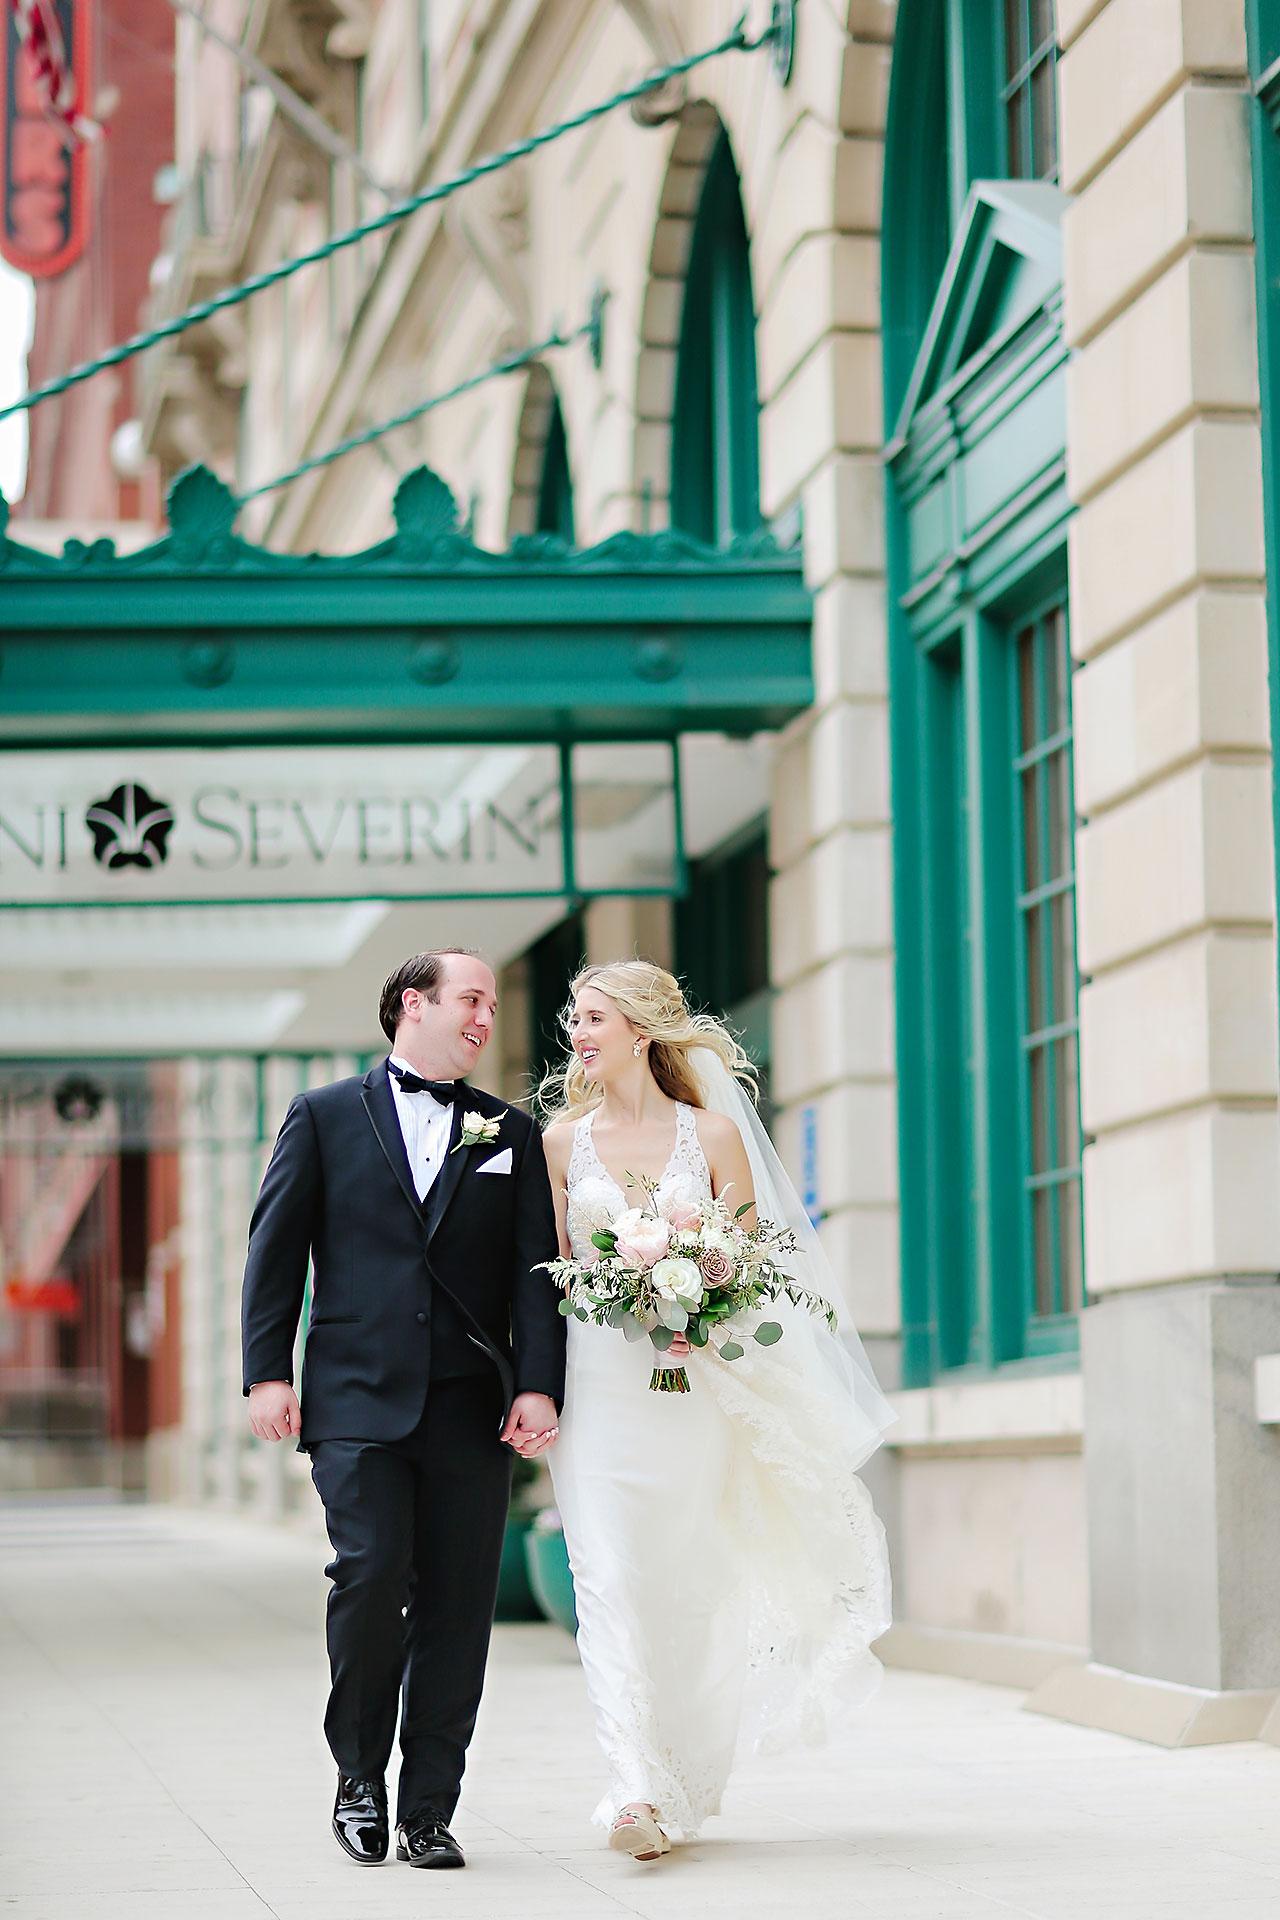 Allison Jeff Union Station Crowne Plaza Indianapolis wedding 069